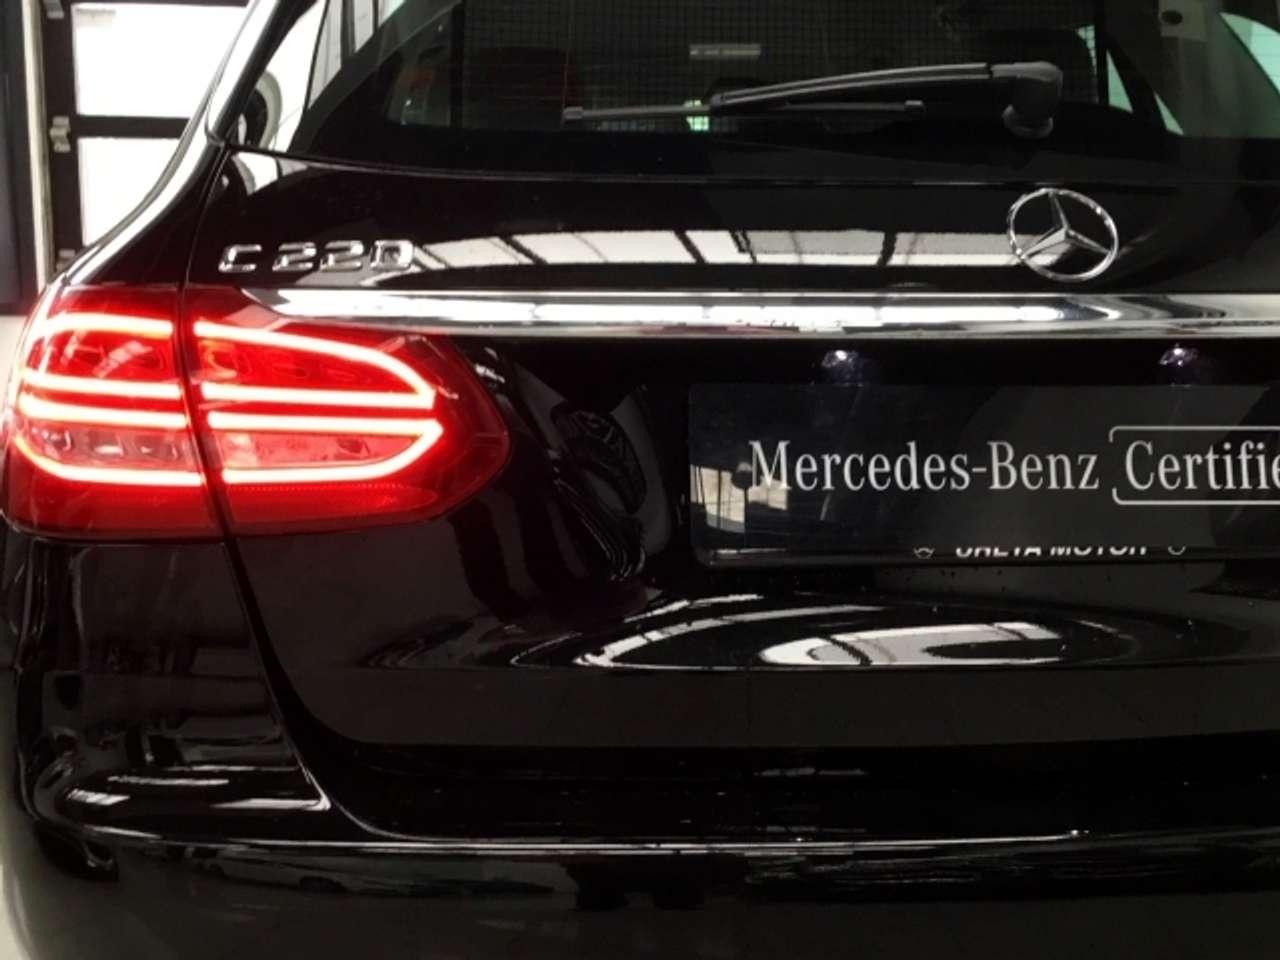 Coches por Mercedes C-Class